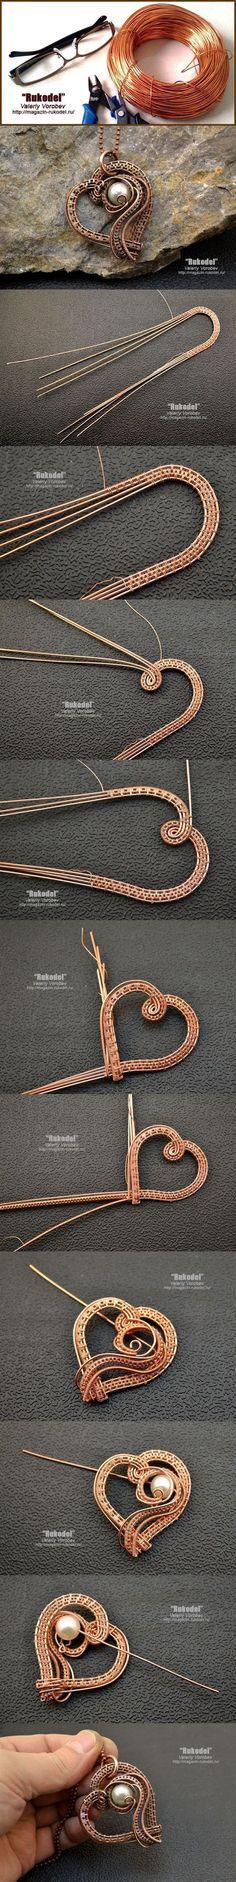 Wire Wrap Pendant - magazin-rukodel.ru/...